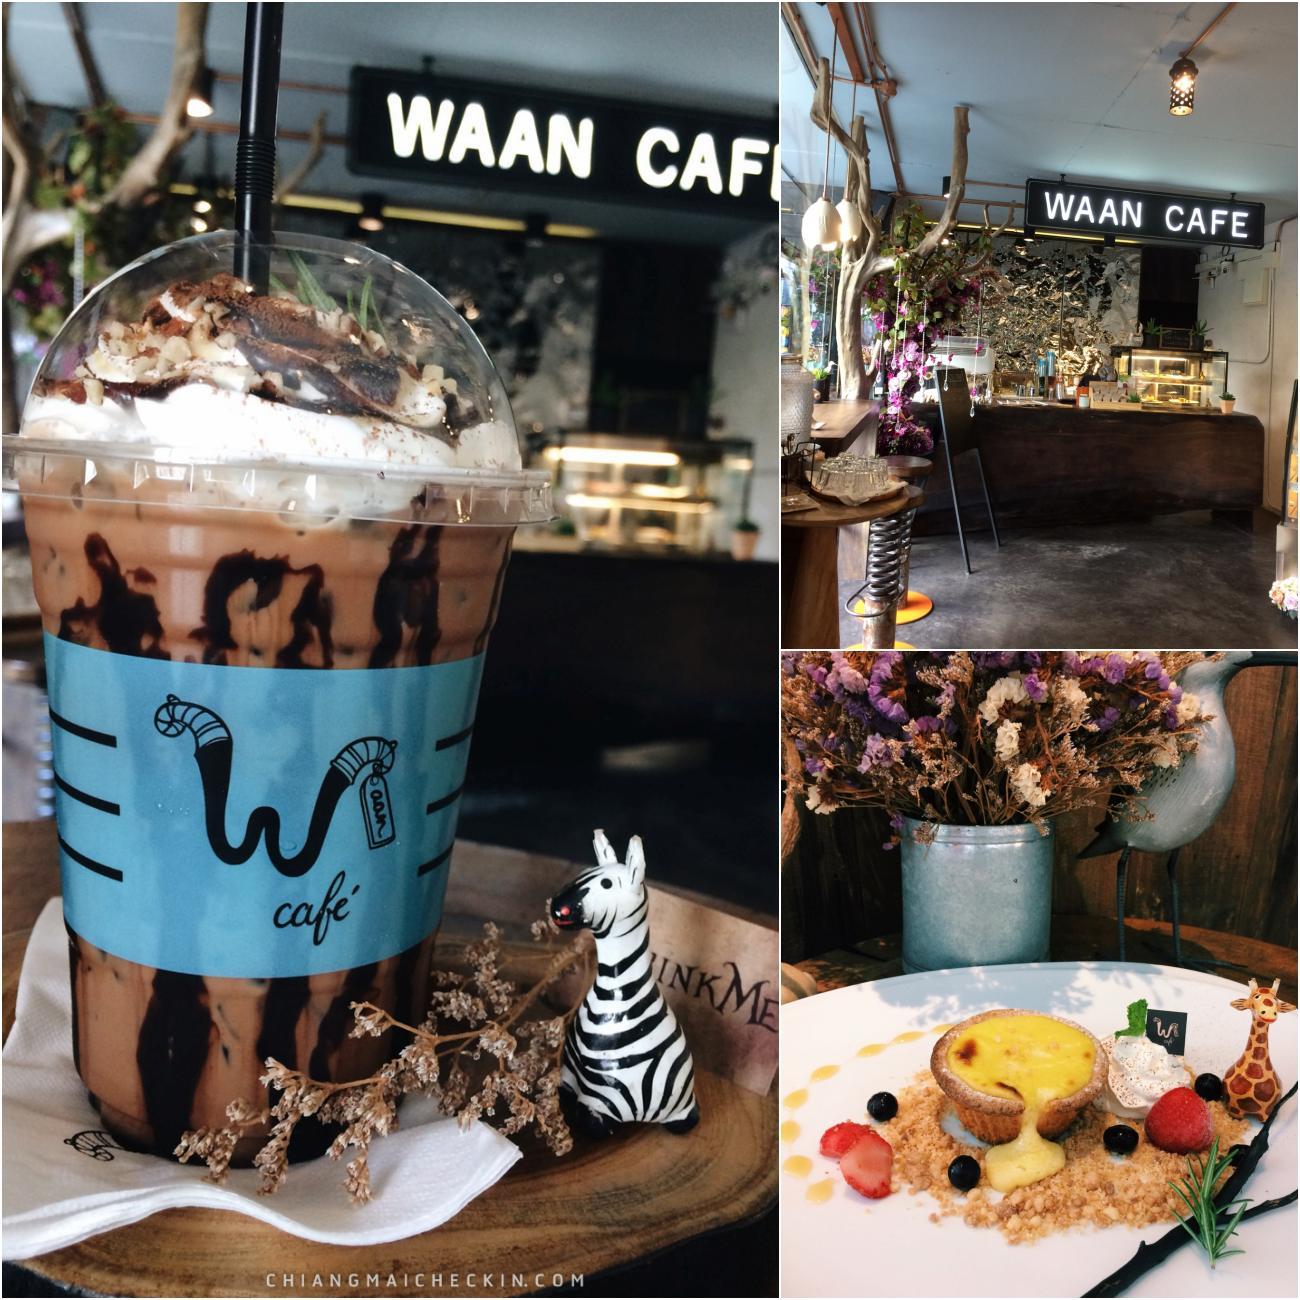 Waan Caf Nimman ร้านน่ารักสไตล์ Magic and Miracle ตกแต่งสวย เจ้าของร้านแนะนำ High tea wonder forest and Hokkaido double fromage มาลองชิมกันเลย